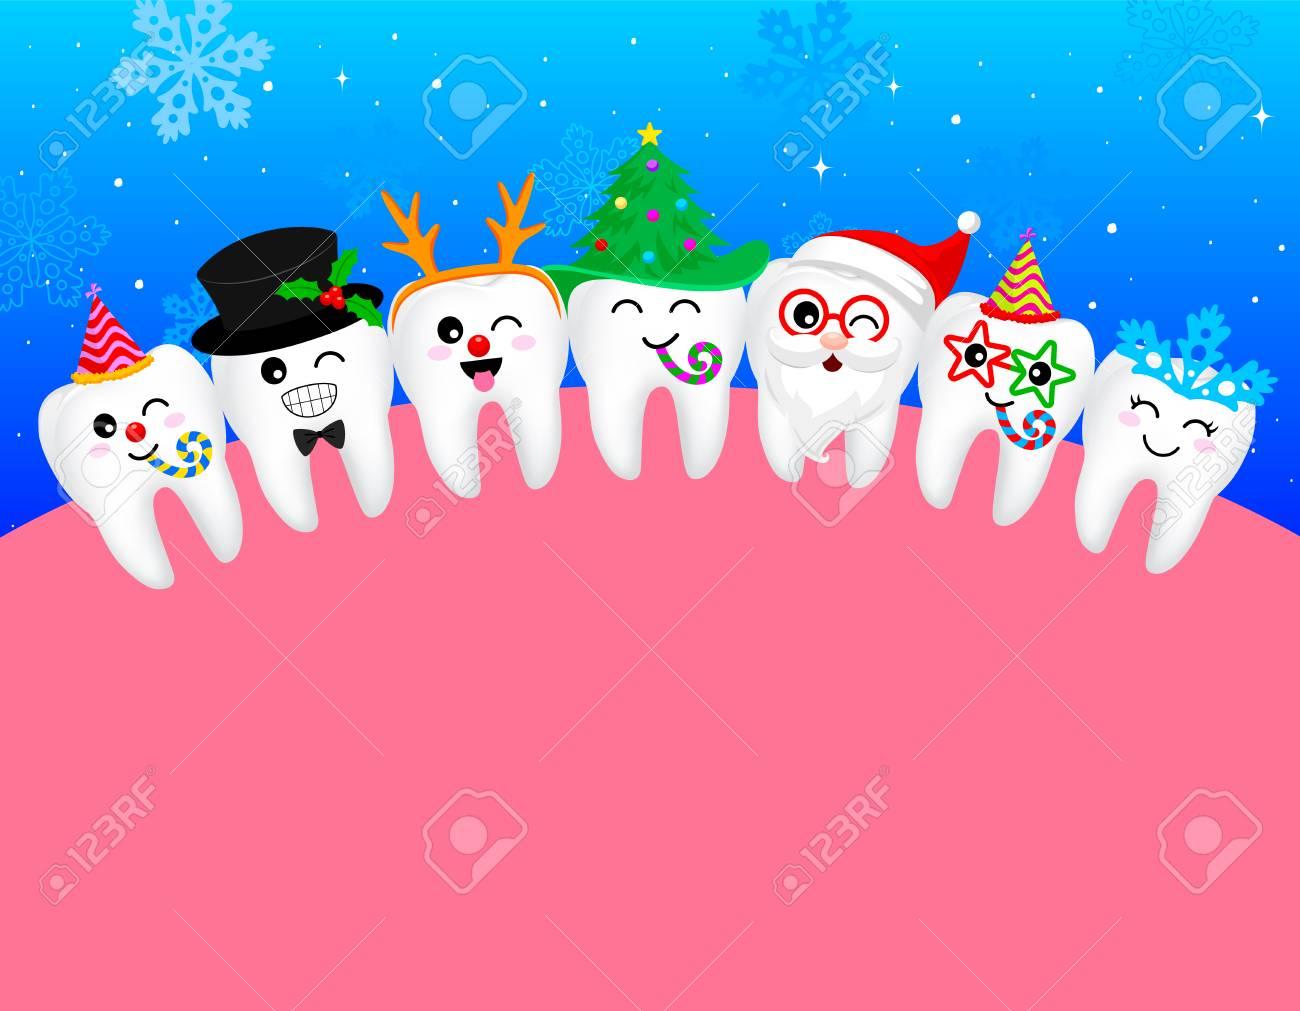 Christmas Celebration Cartoon Images.Happy Cute Cartoon Tooth Snowflake Santa Claus Xmas Tree